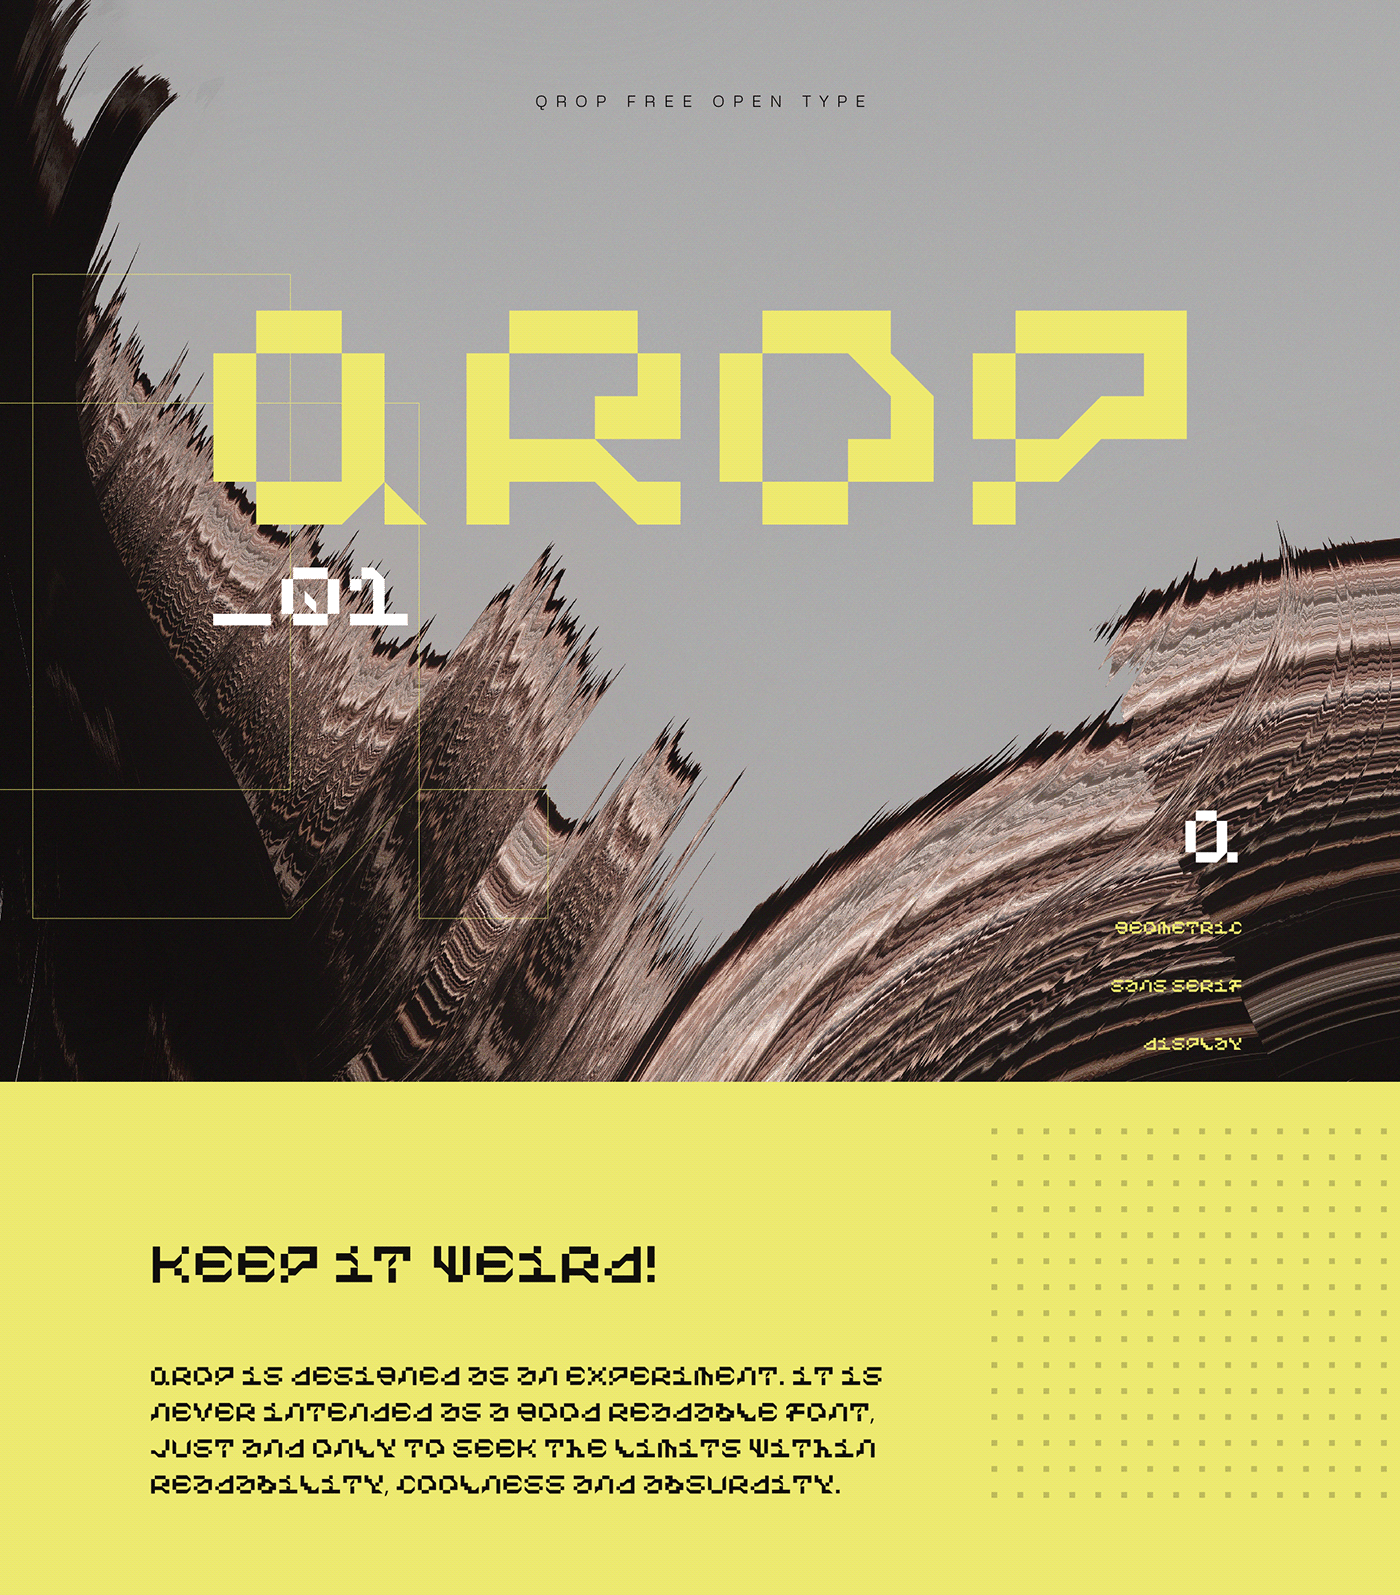 black crazy font Digital Font font fontdesign free type open type tru type yellow